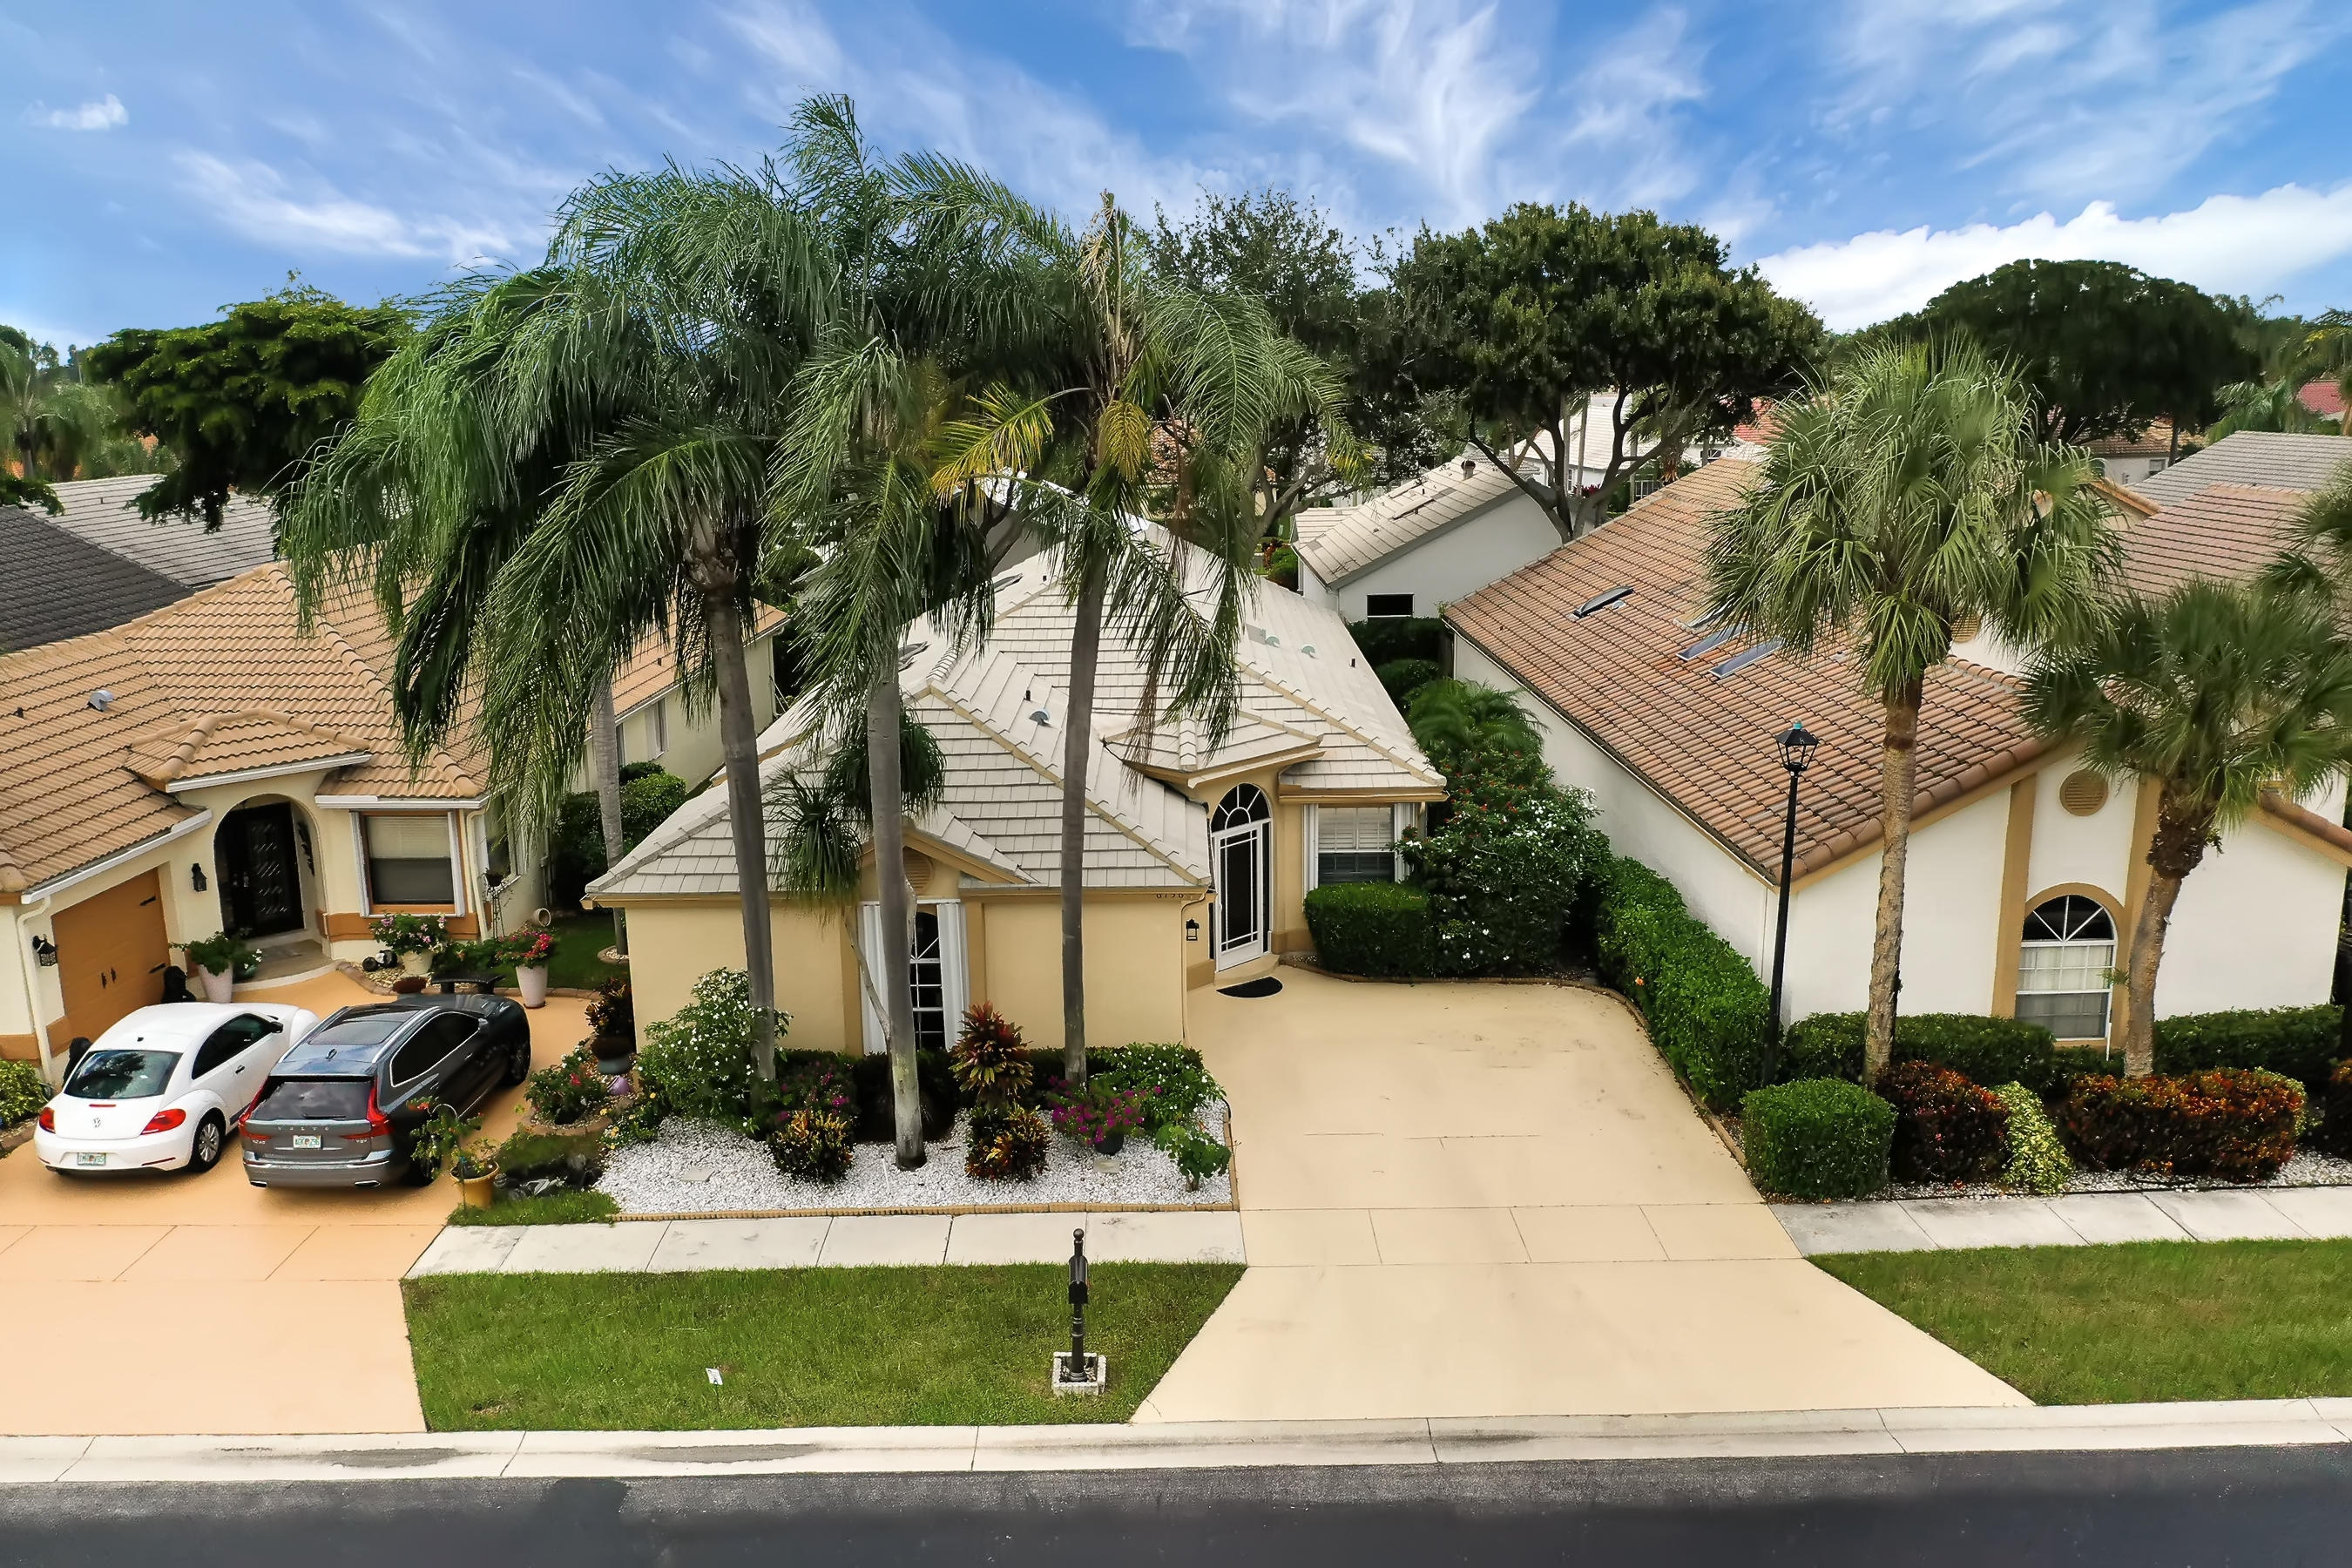 Home for sale in Lakeridge Boynton Beach Florida